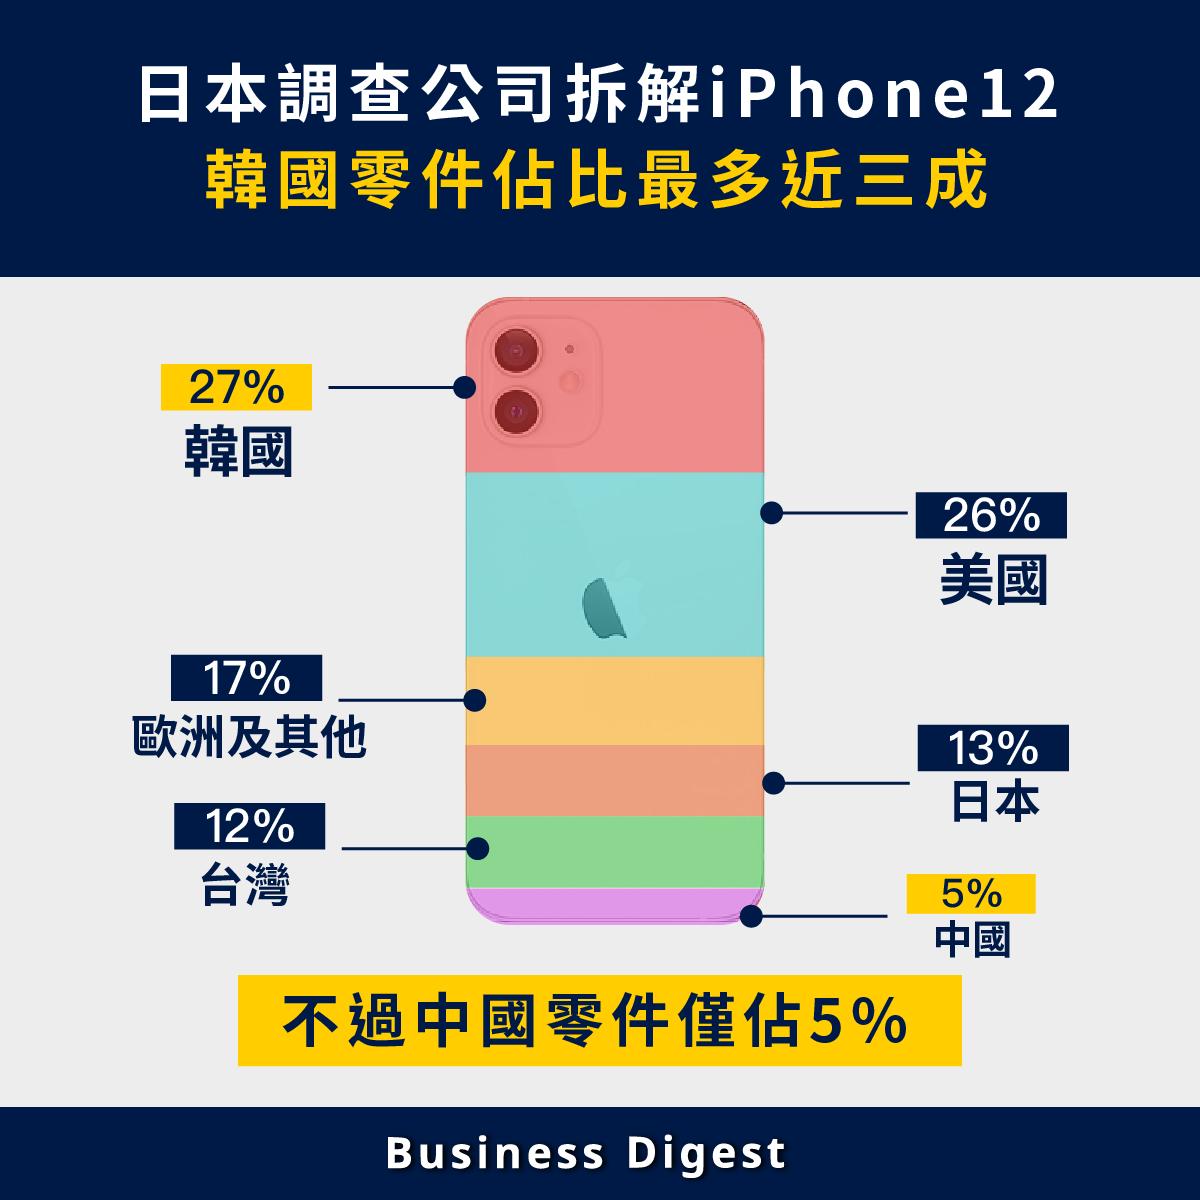 日本調查公司Fomalhaut Technology Solutions發佈iPhone12 的拆解調查